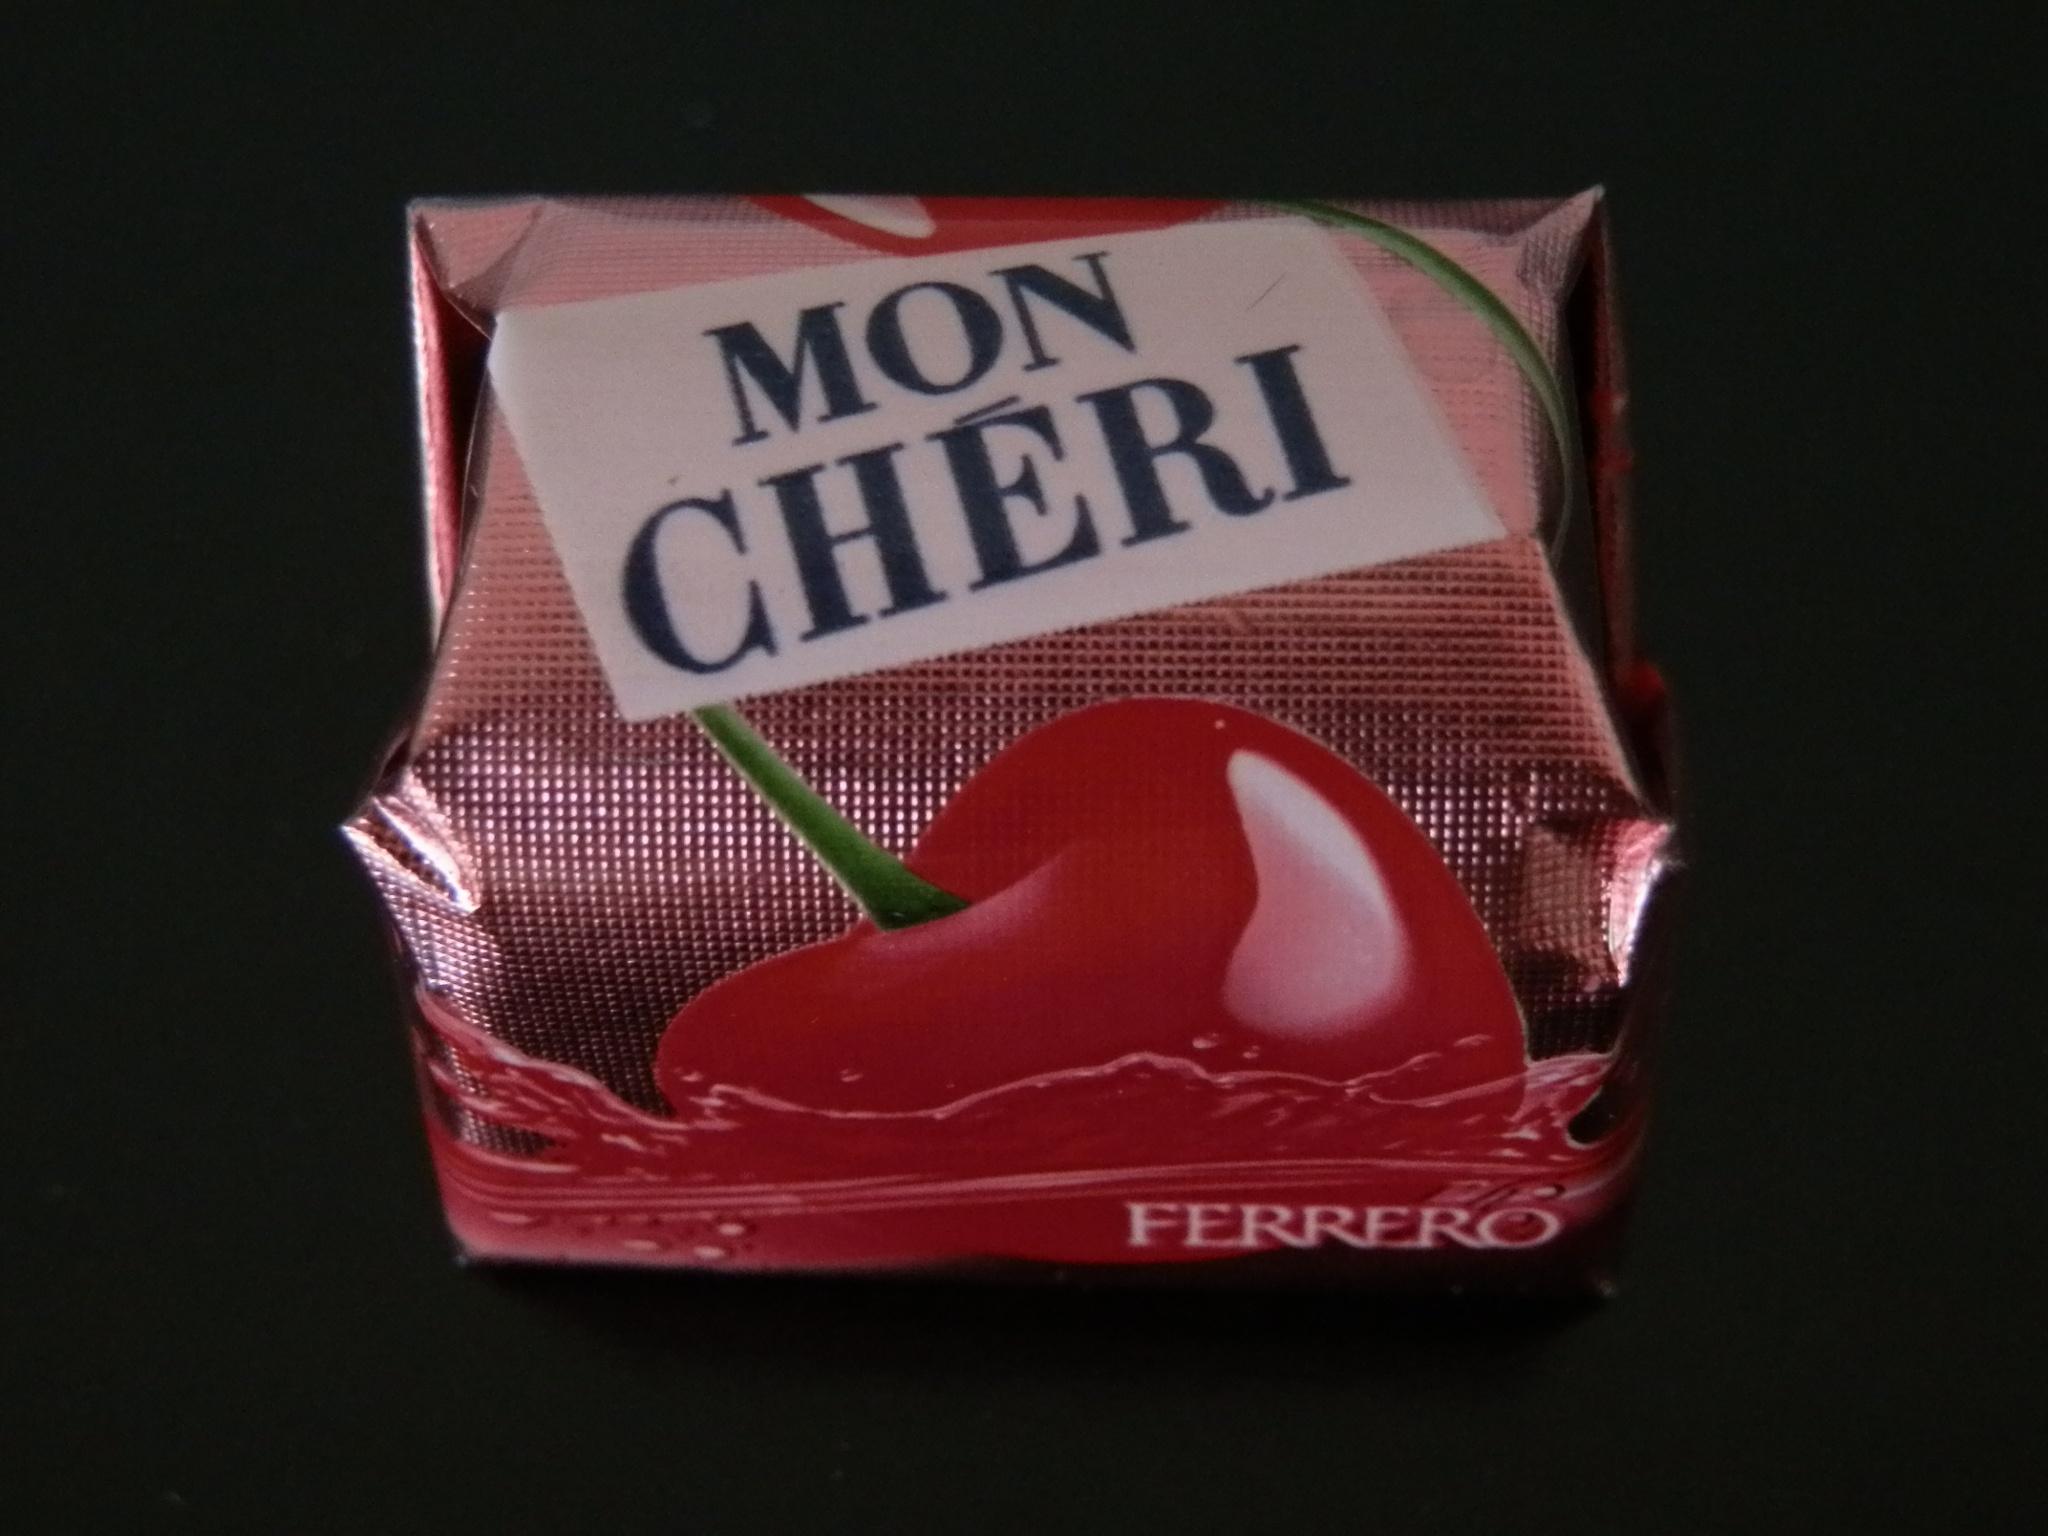 mon chéri by photoSophy1990